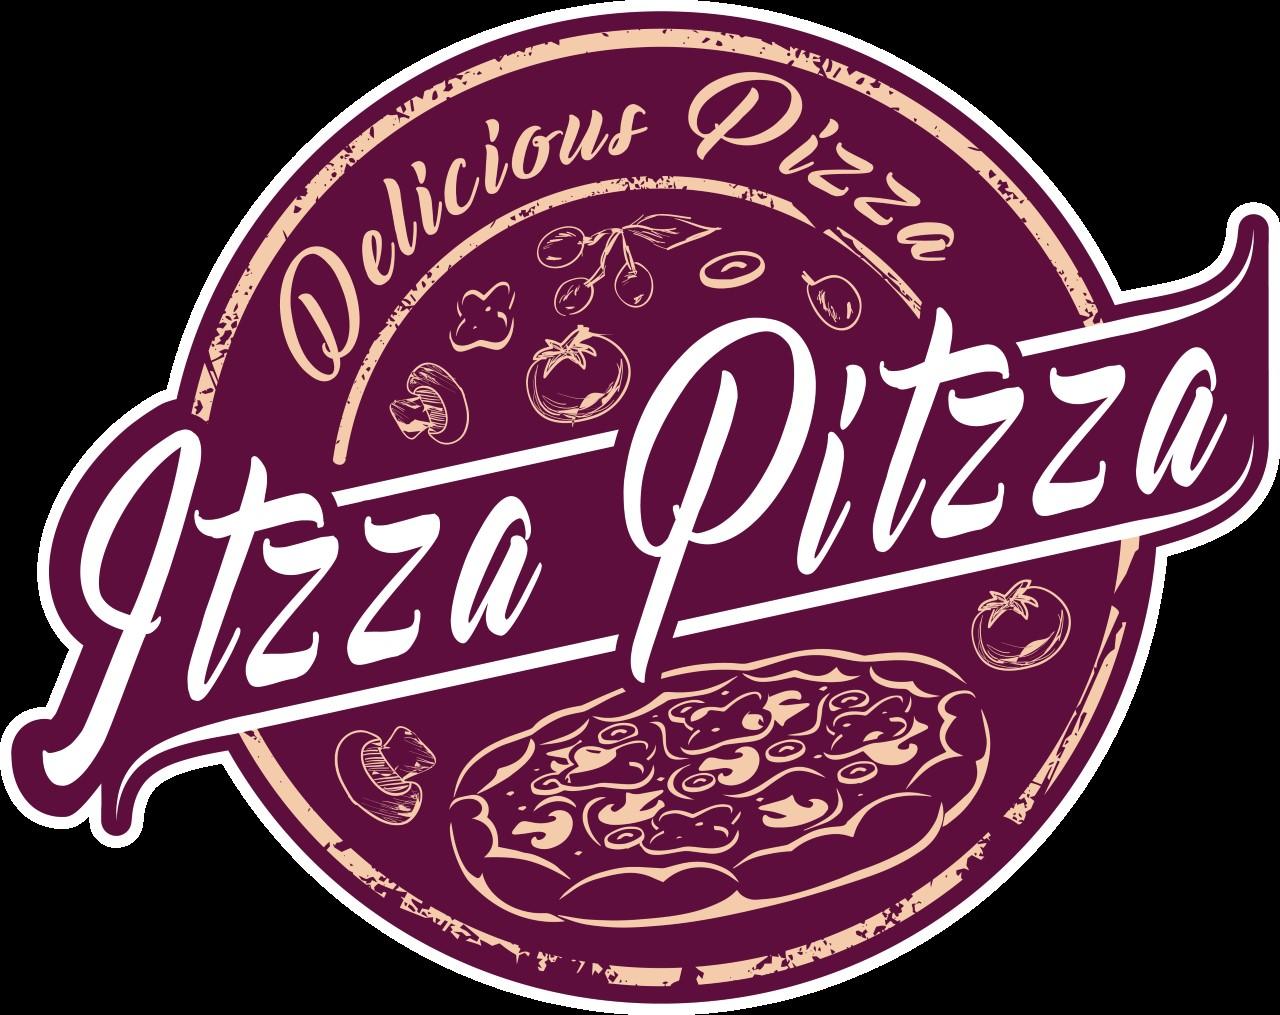 itzza pitzza in Karachi, Karachi City at PakBD com Business Directory